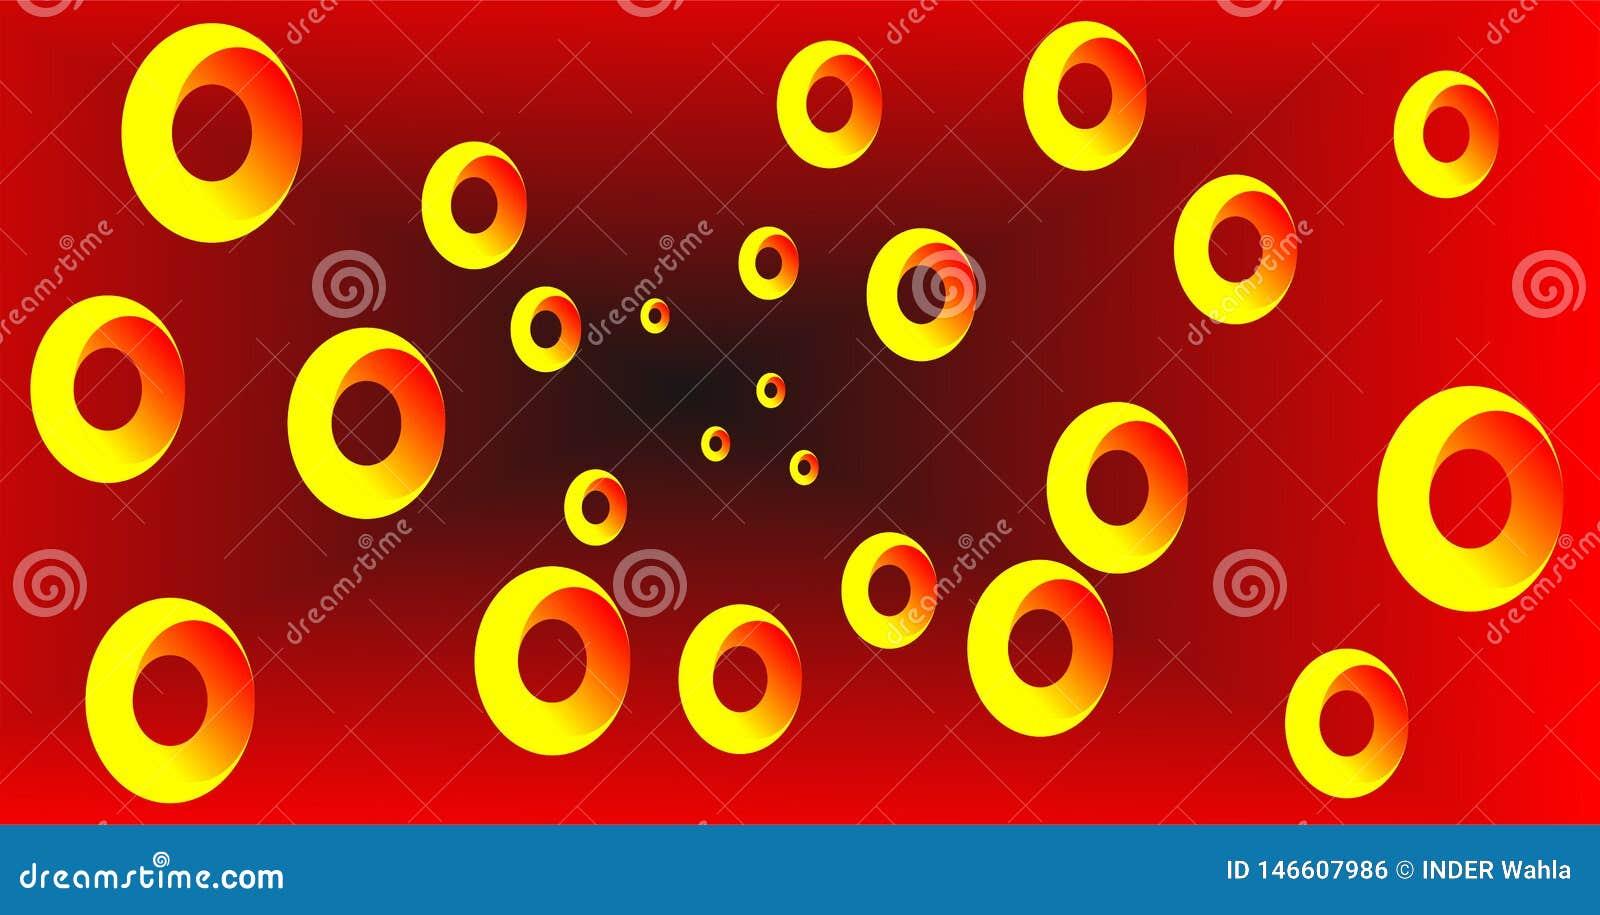 Mezcla roja y negra, efecto amarillo de la ronda 3d